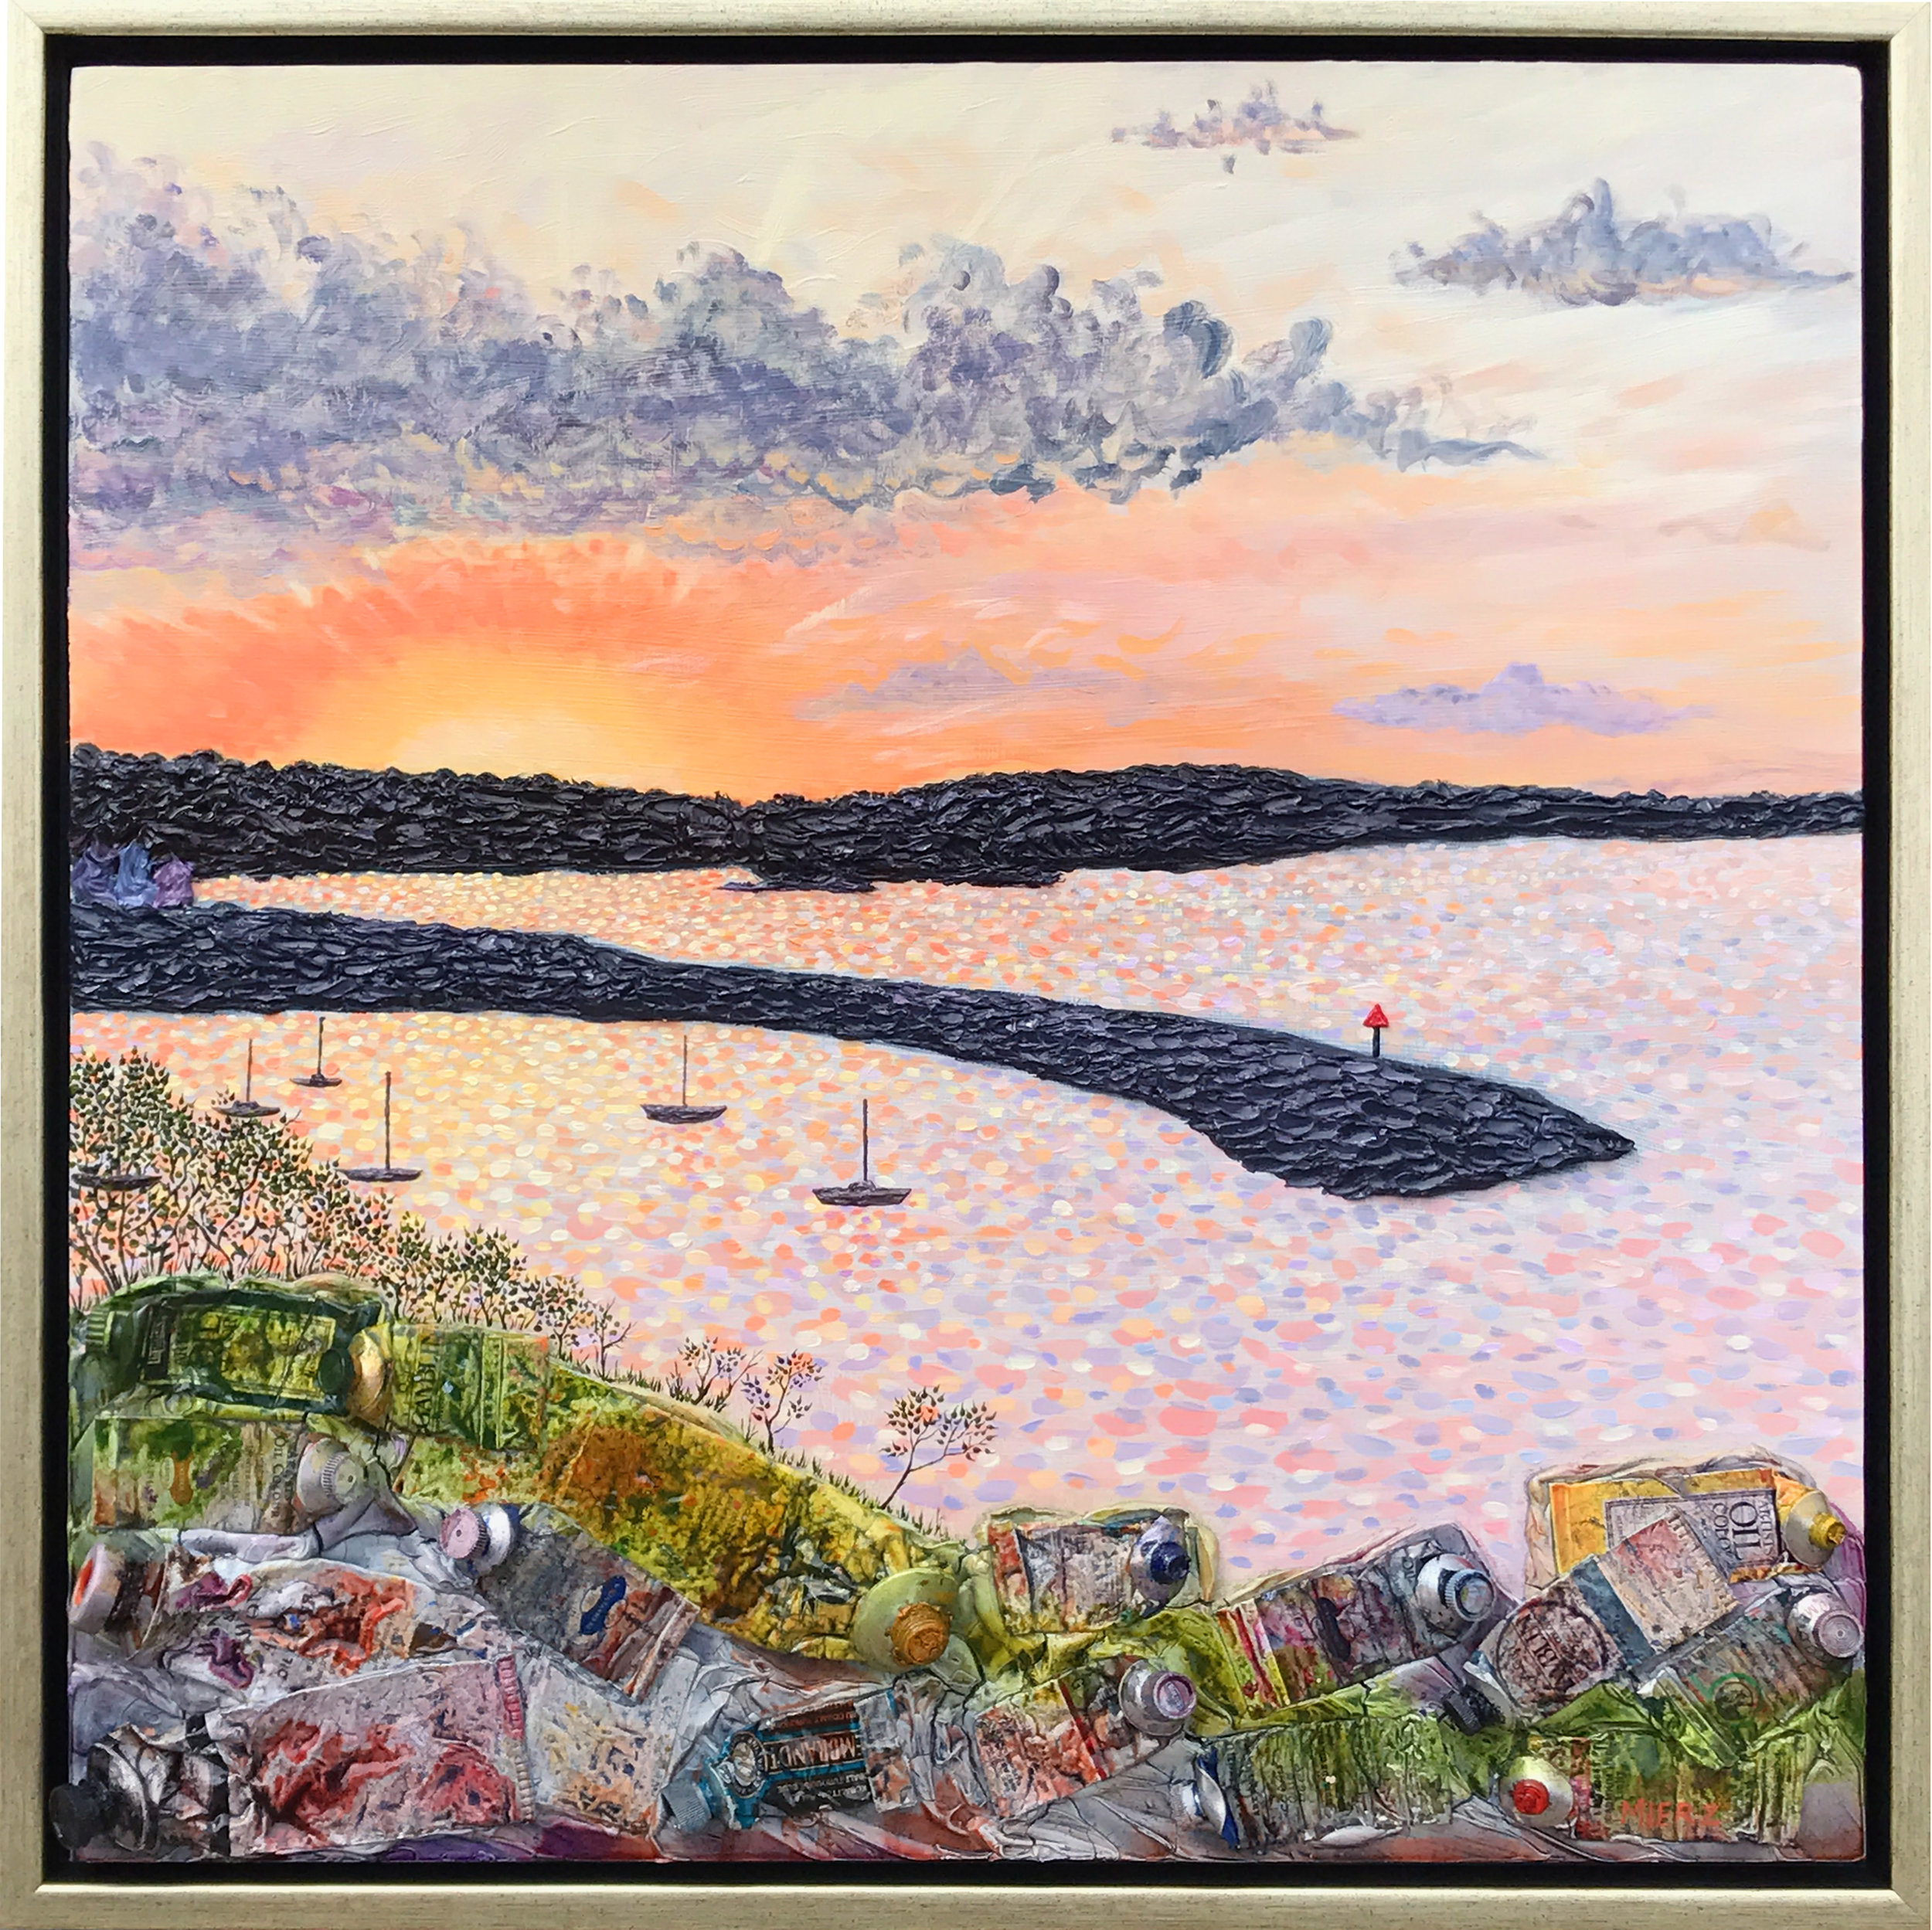 Evening on the Headlands